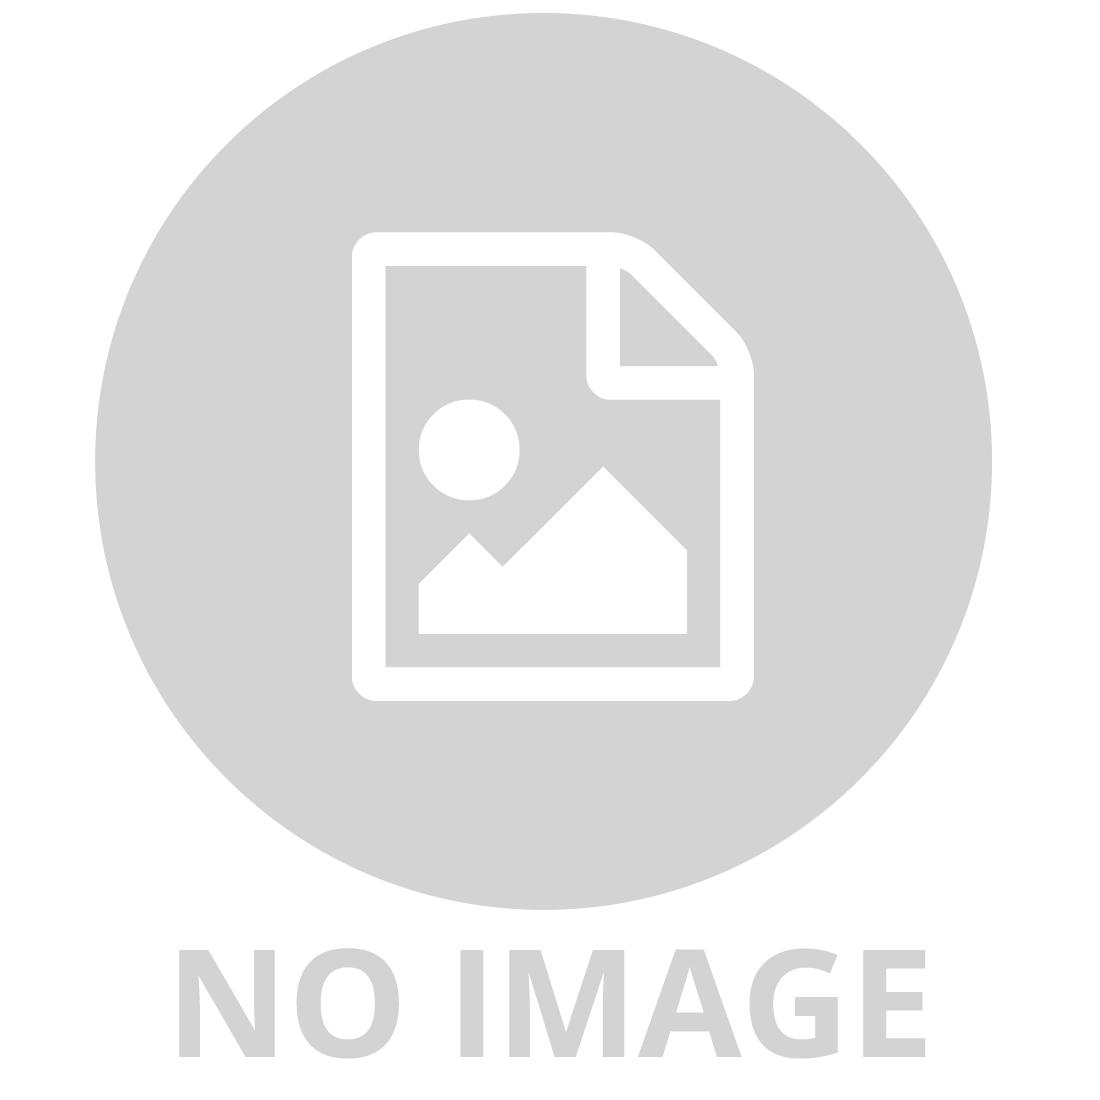 RAVENSBURGER 1000 PCE JIGSAW PUZZLE - JOKULSARLON ISLAND